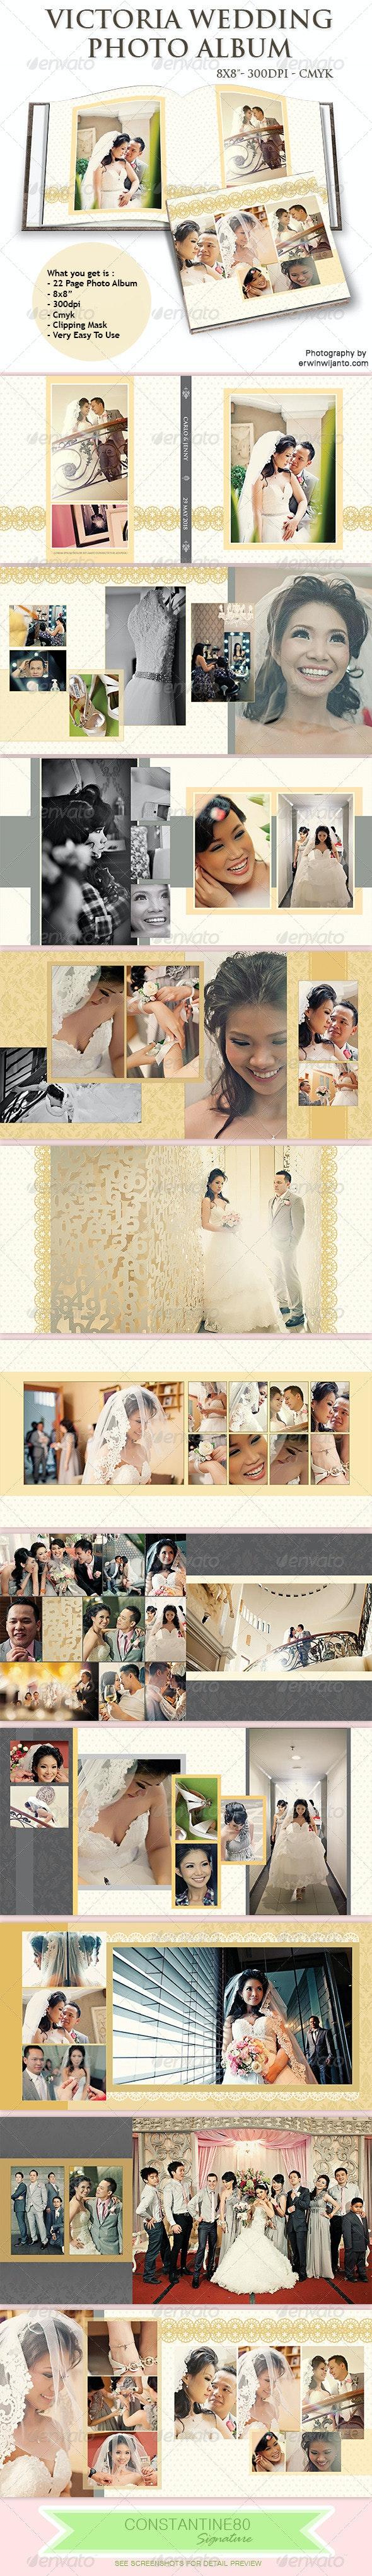 Victoria Wedding Photo Album - Photo Albums Print Templates